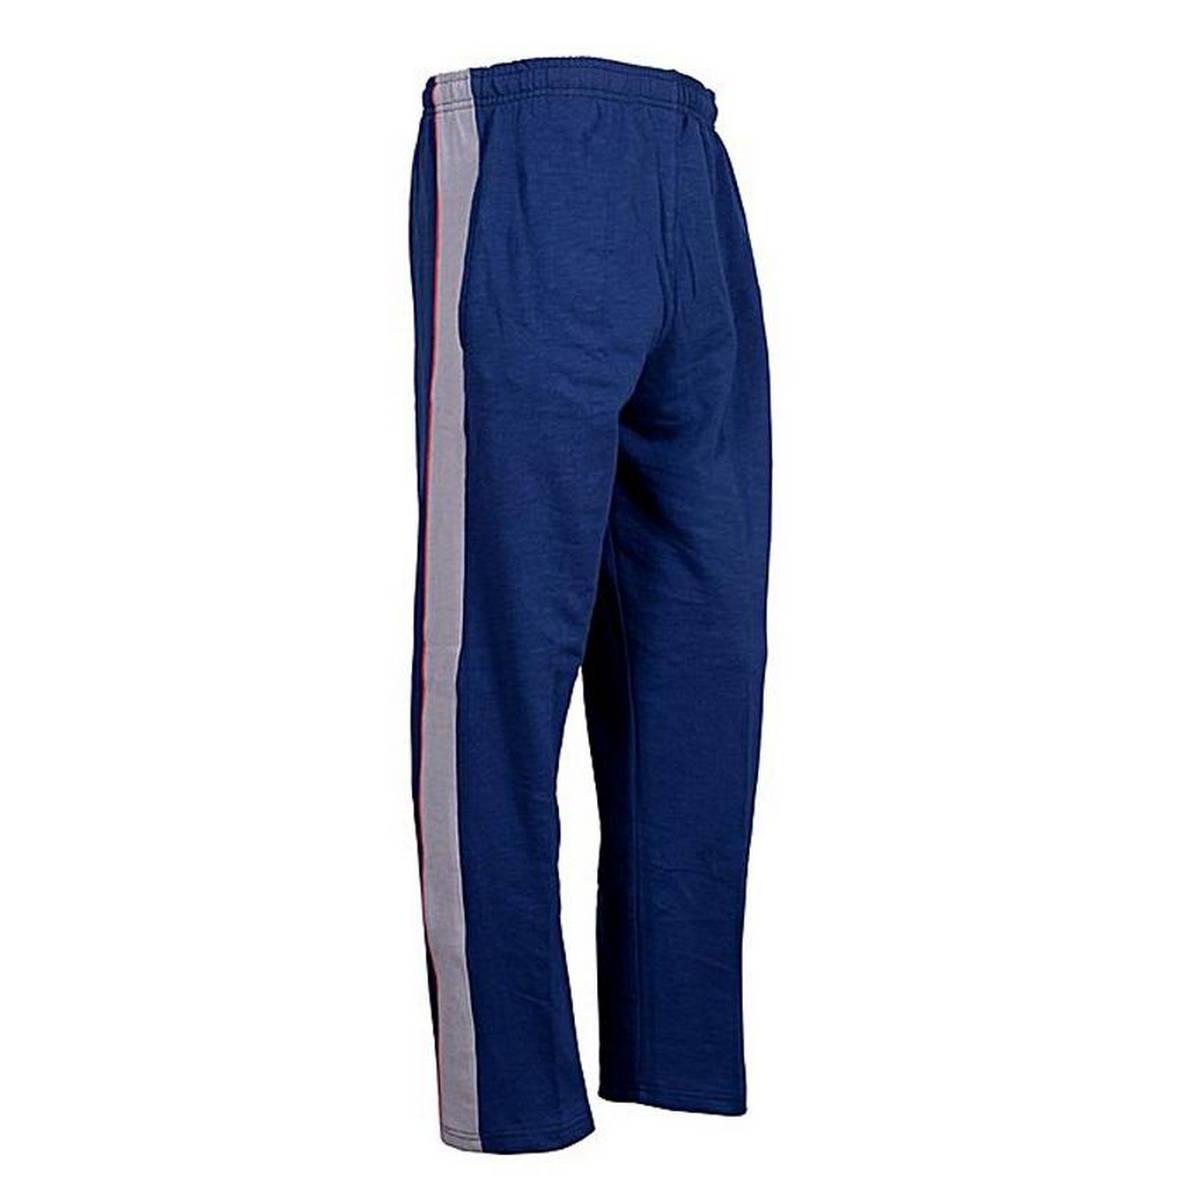 Cotton Cargo Trouser For Men